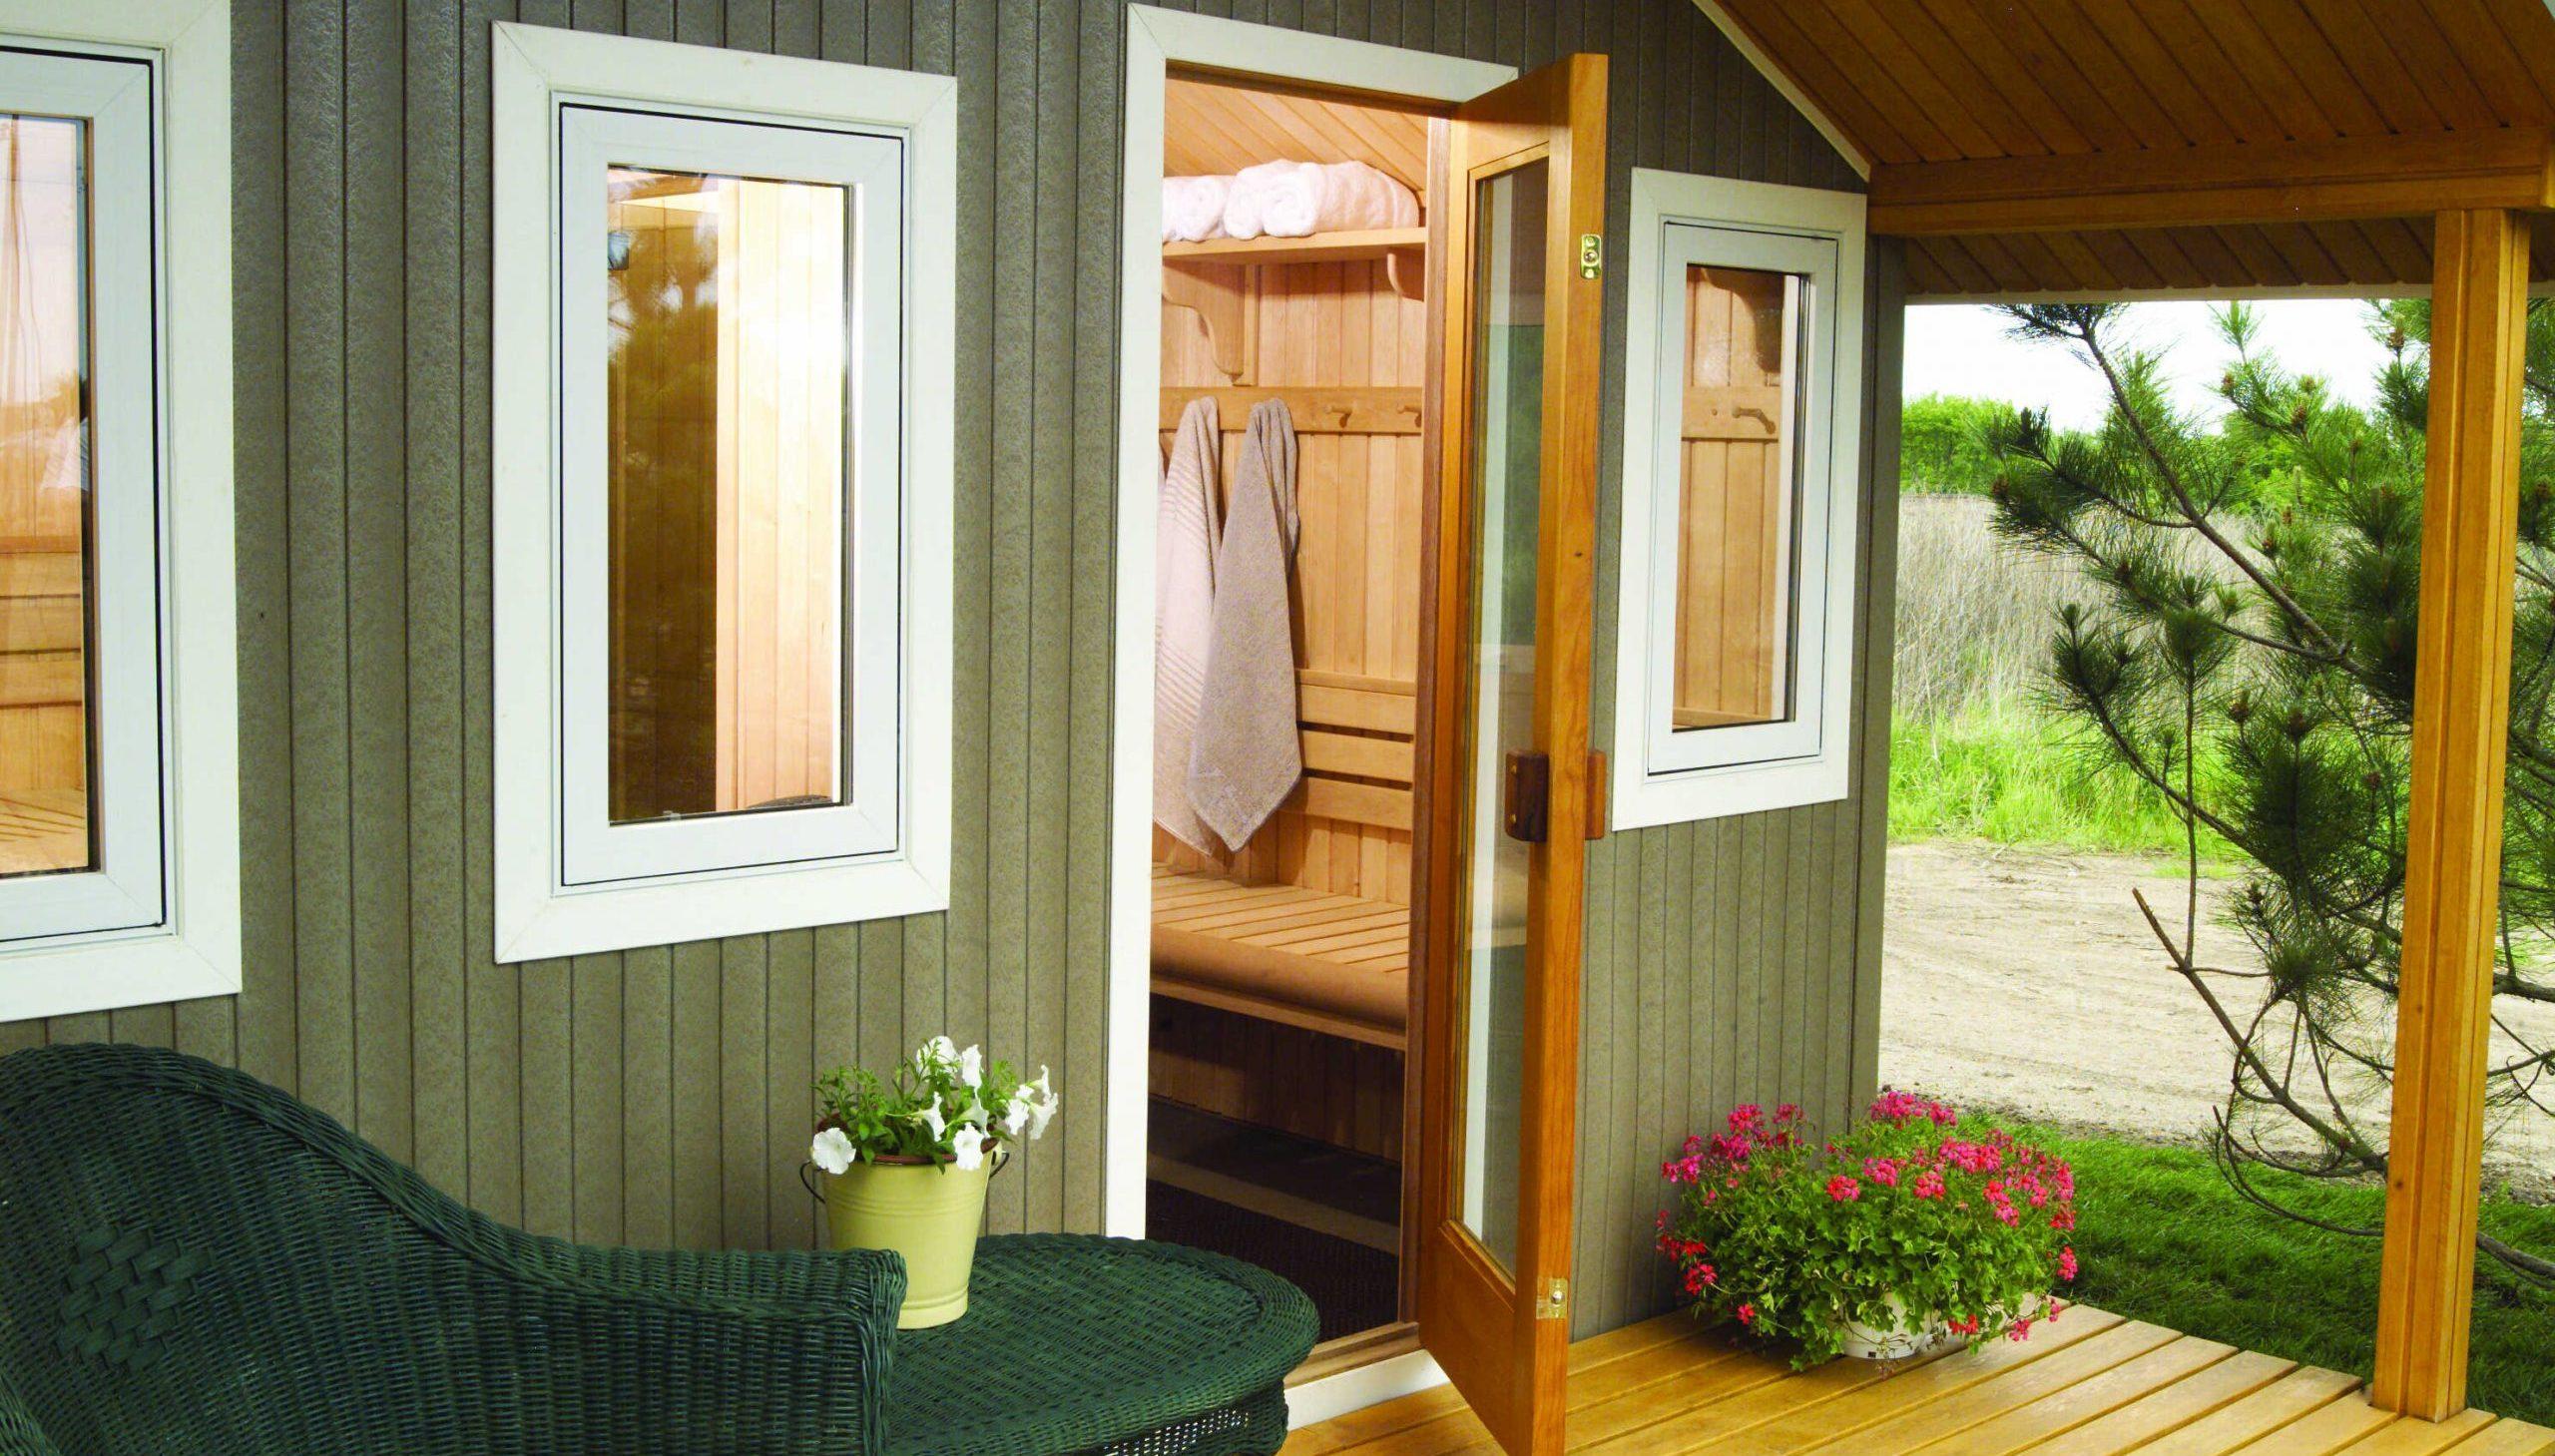 Summertime Sauna Bathing